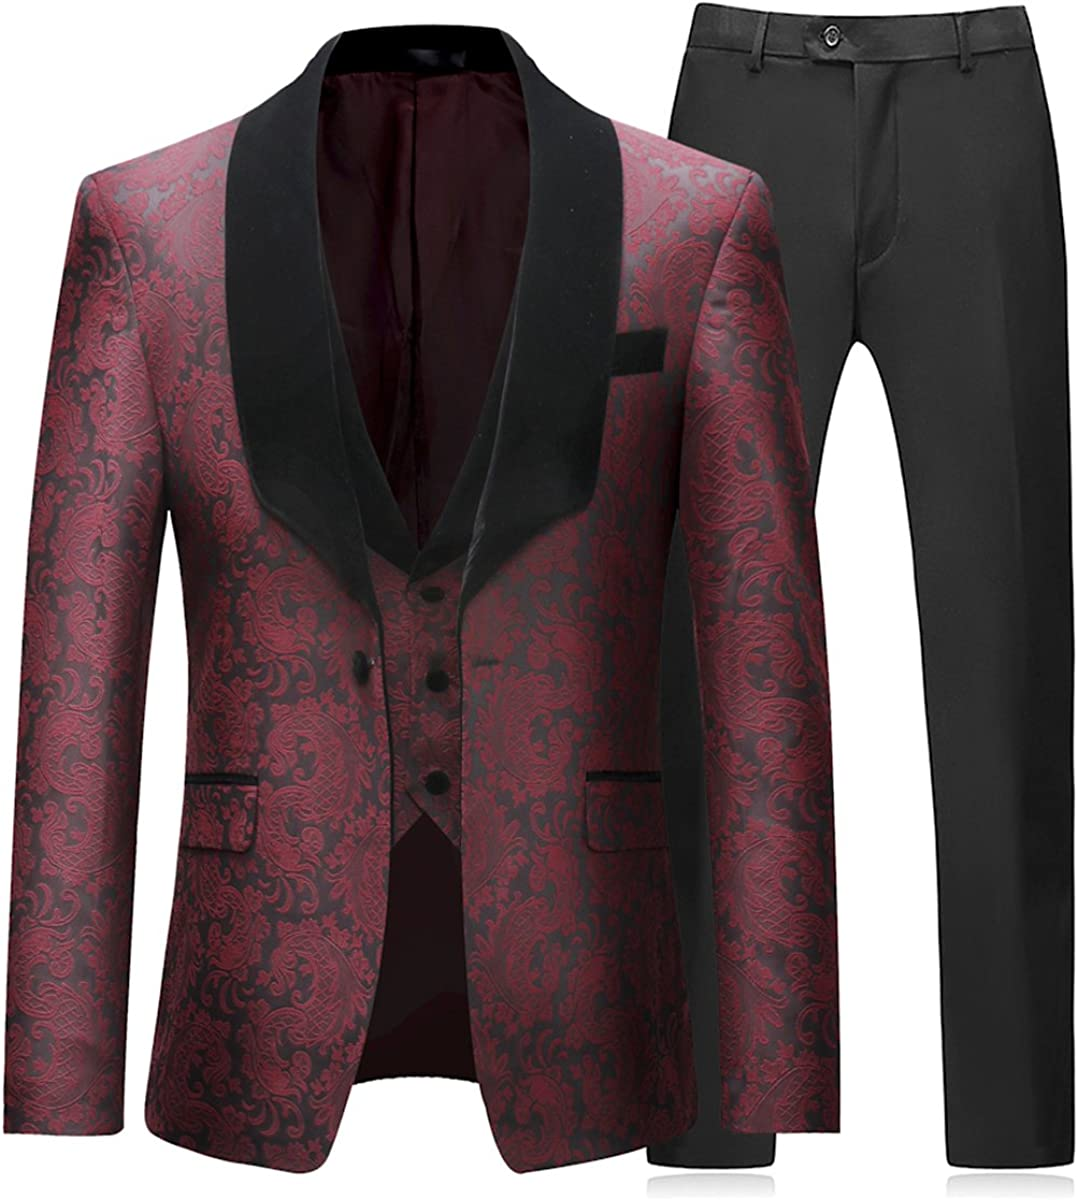 Mens 3 Pieces Tuxedo Suit Black Gothic Suit Wedding Business Jacquard Shawl Lapel Tuxedo Blazer Waistcoat Trousers